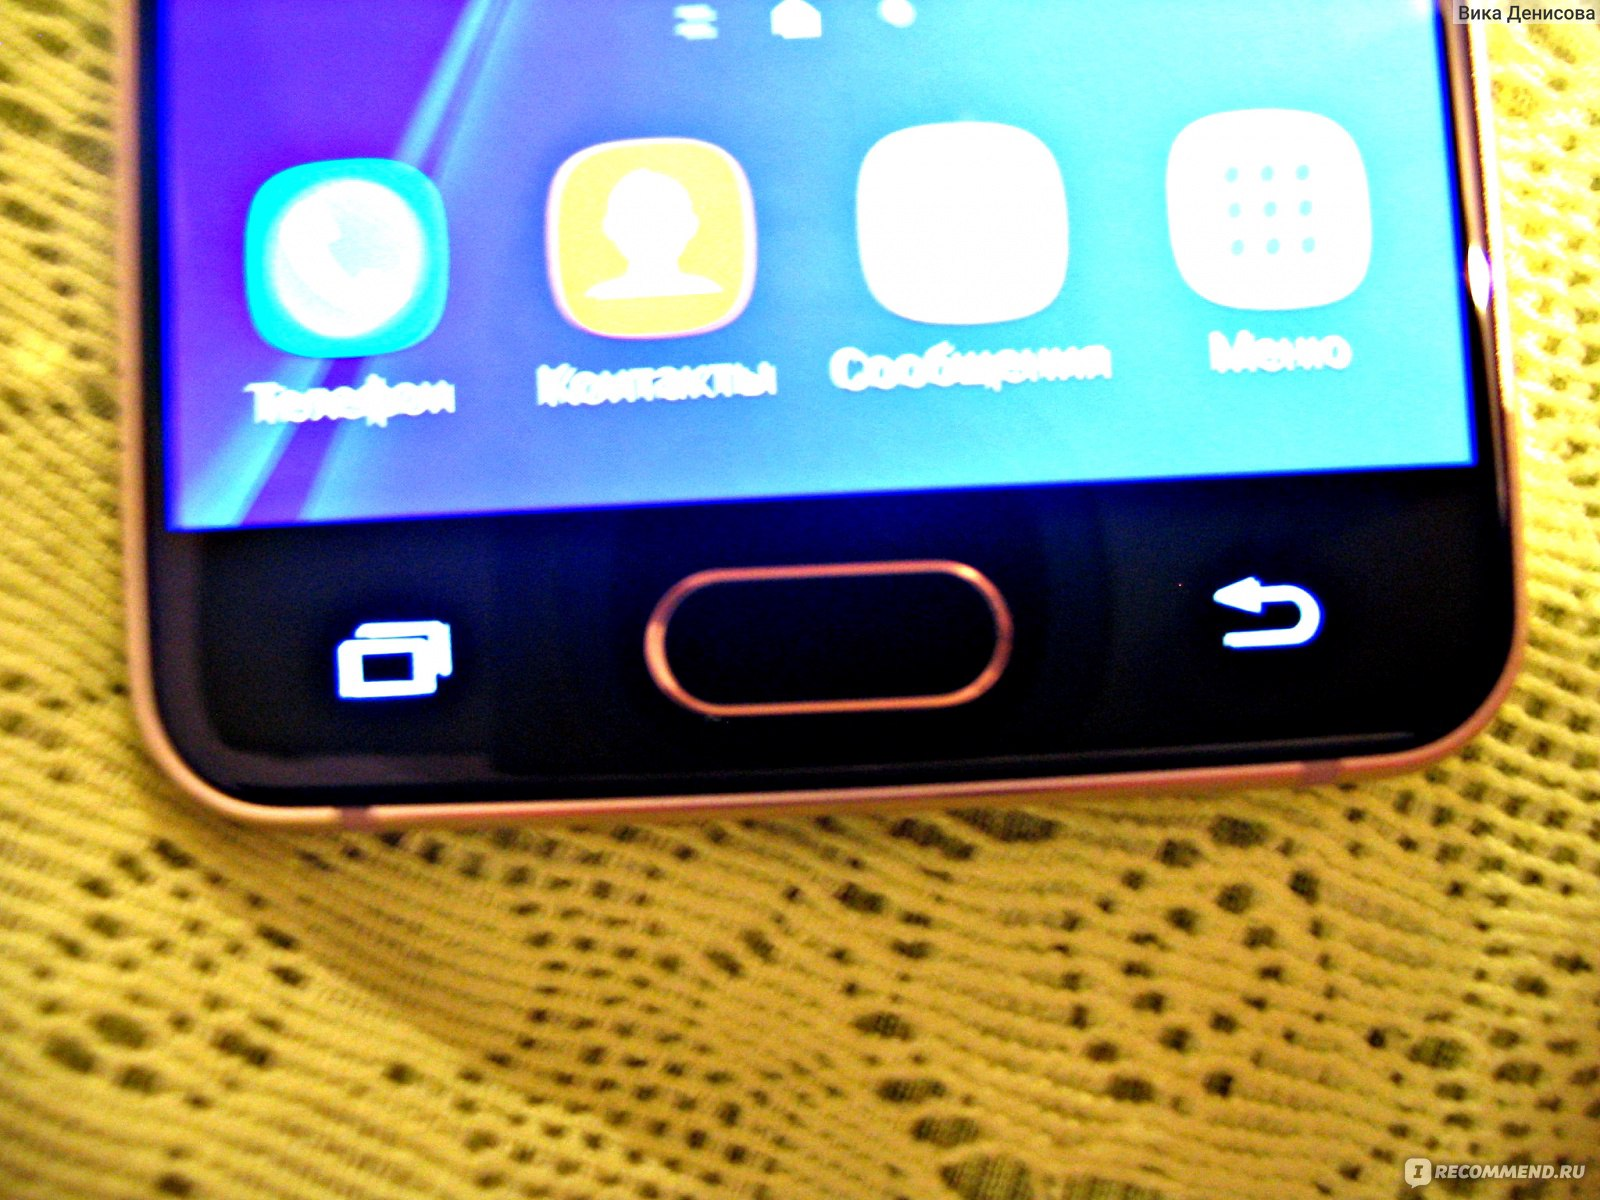 Смартфон Самсунг А5 : отзывы и характеристики 49